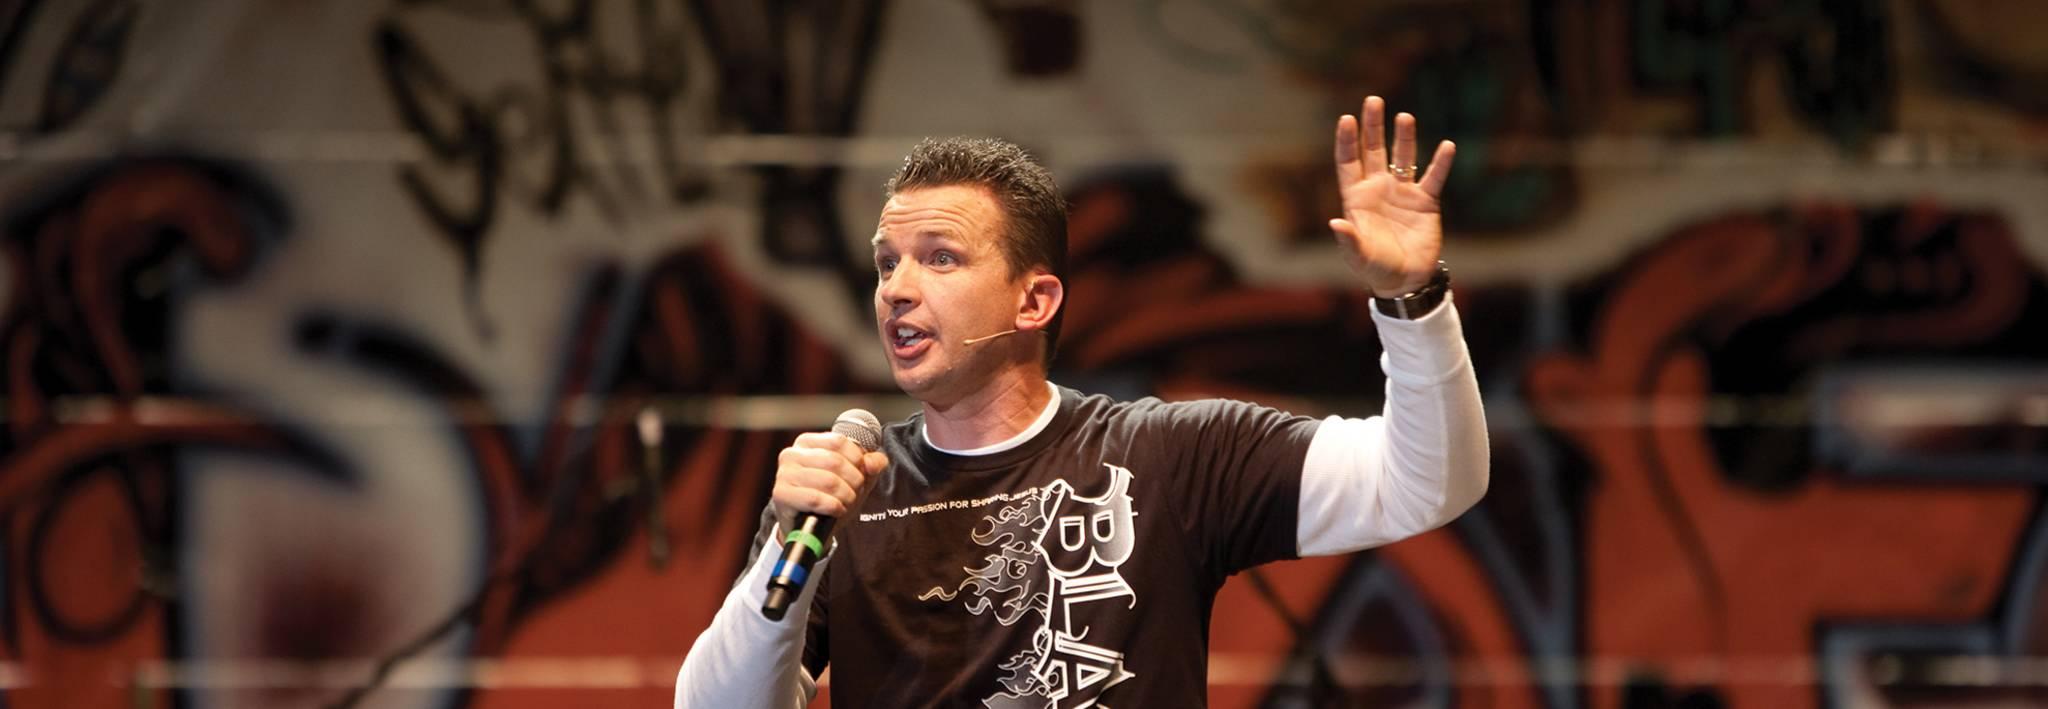 Professional speaker Greg Stier is speaking to Colorado Christian University students.